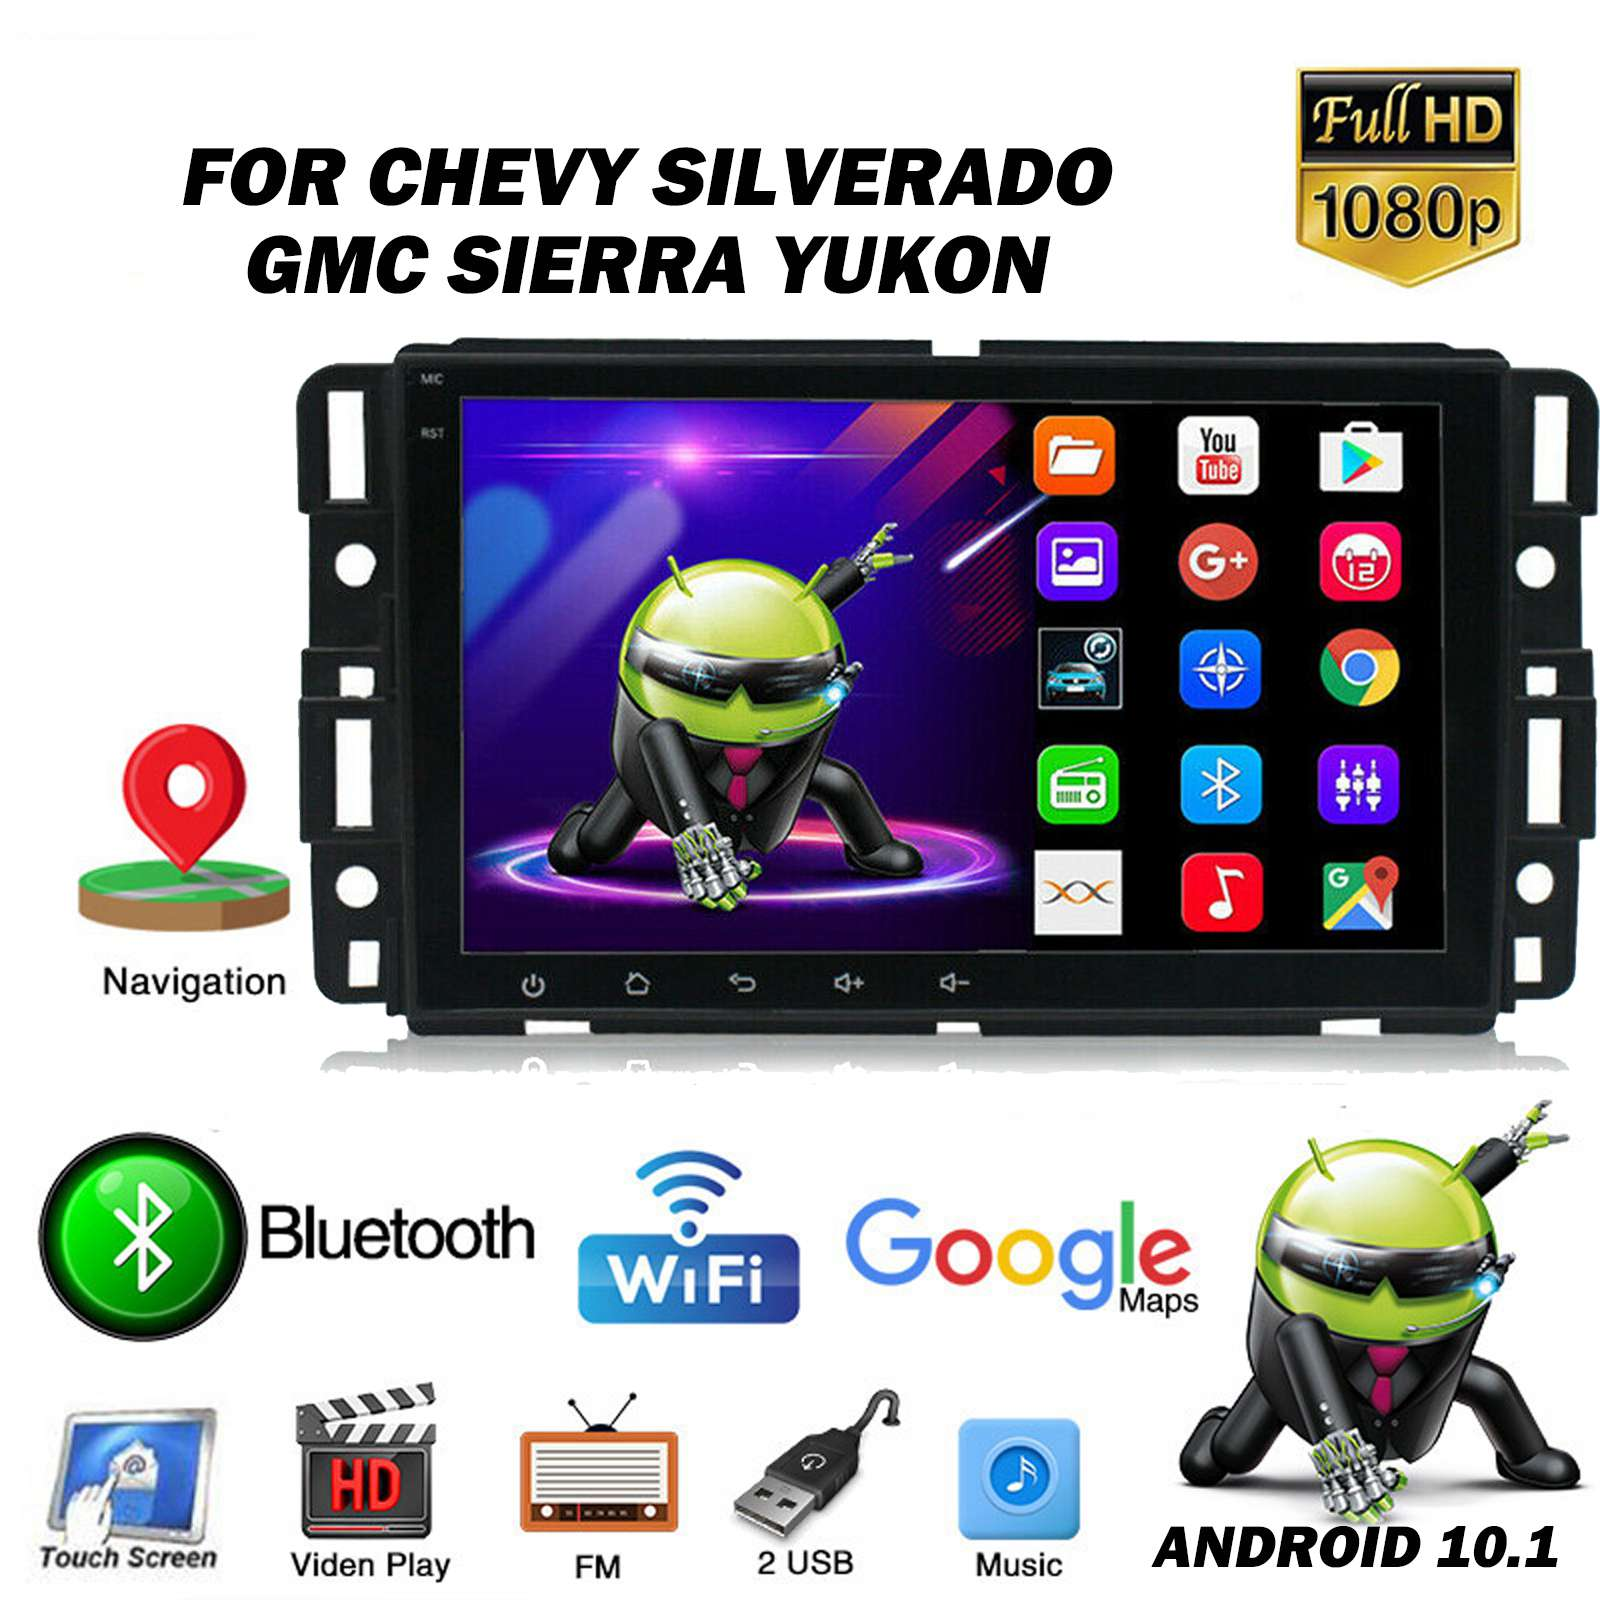 2-din-android-10-1-car-stereo-radio-for-chevy-silverado-gmc-sierra-yukon-gps-navigation-dvd-player-car-multimedia-video-player